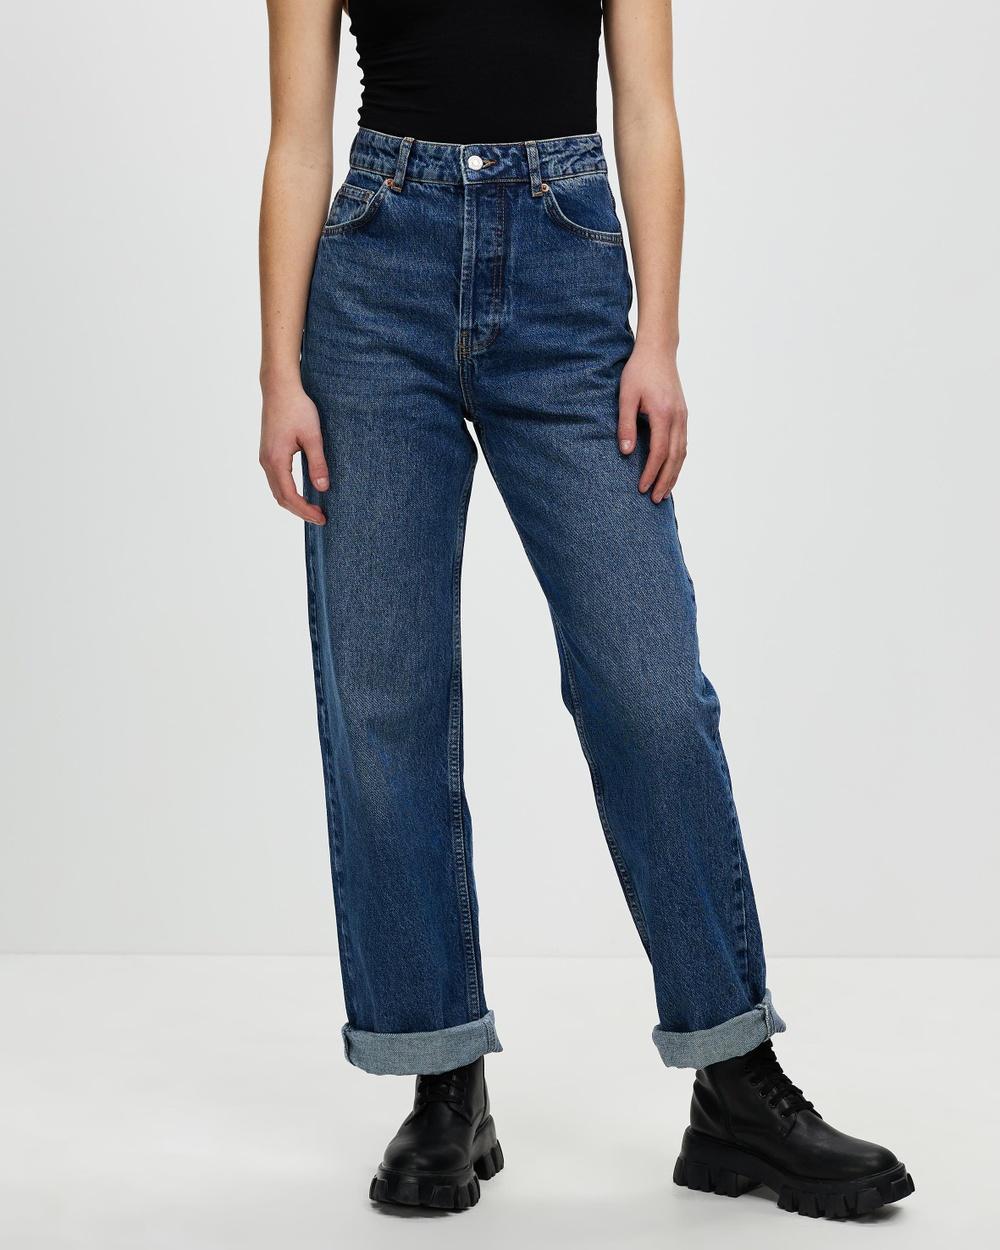 TOPSHOP High Waisted Oversized Mom Jeans High-Waisted Mid Denim Australia